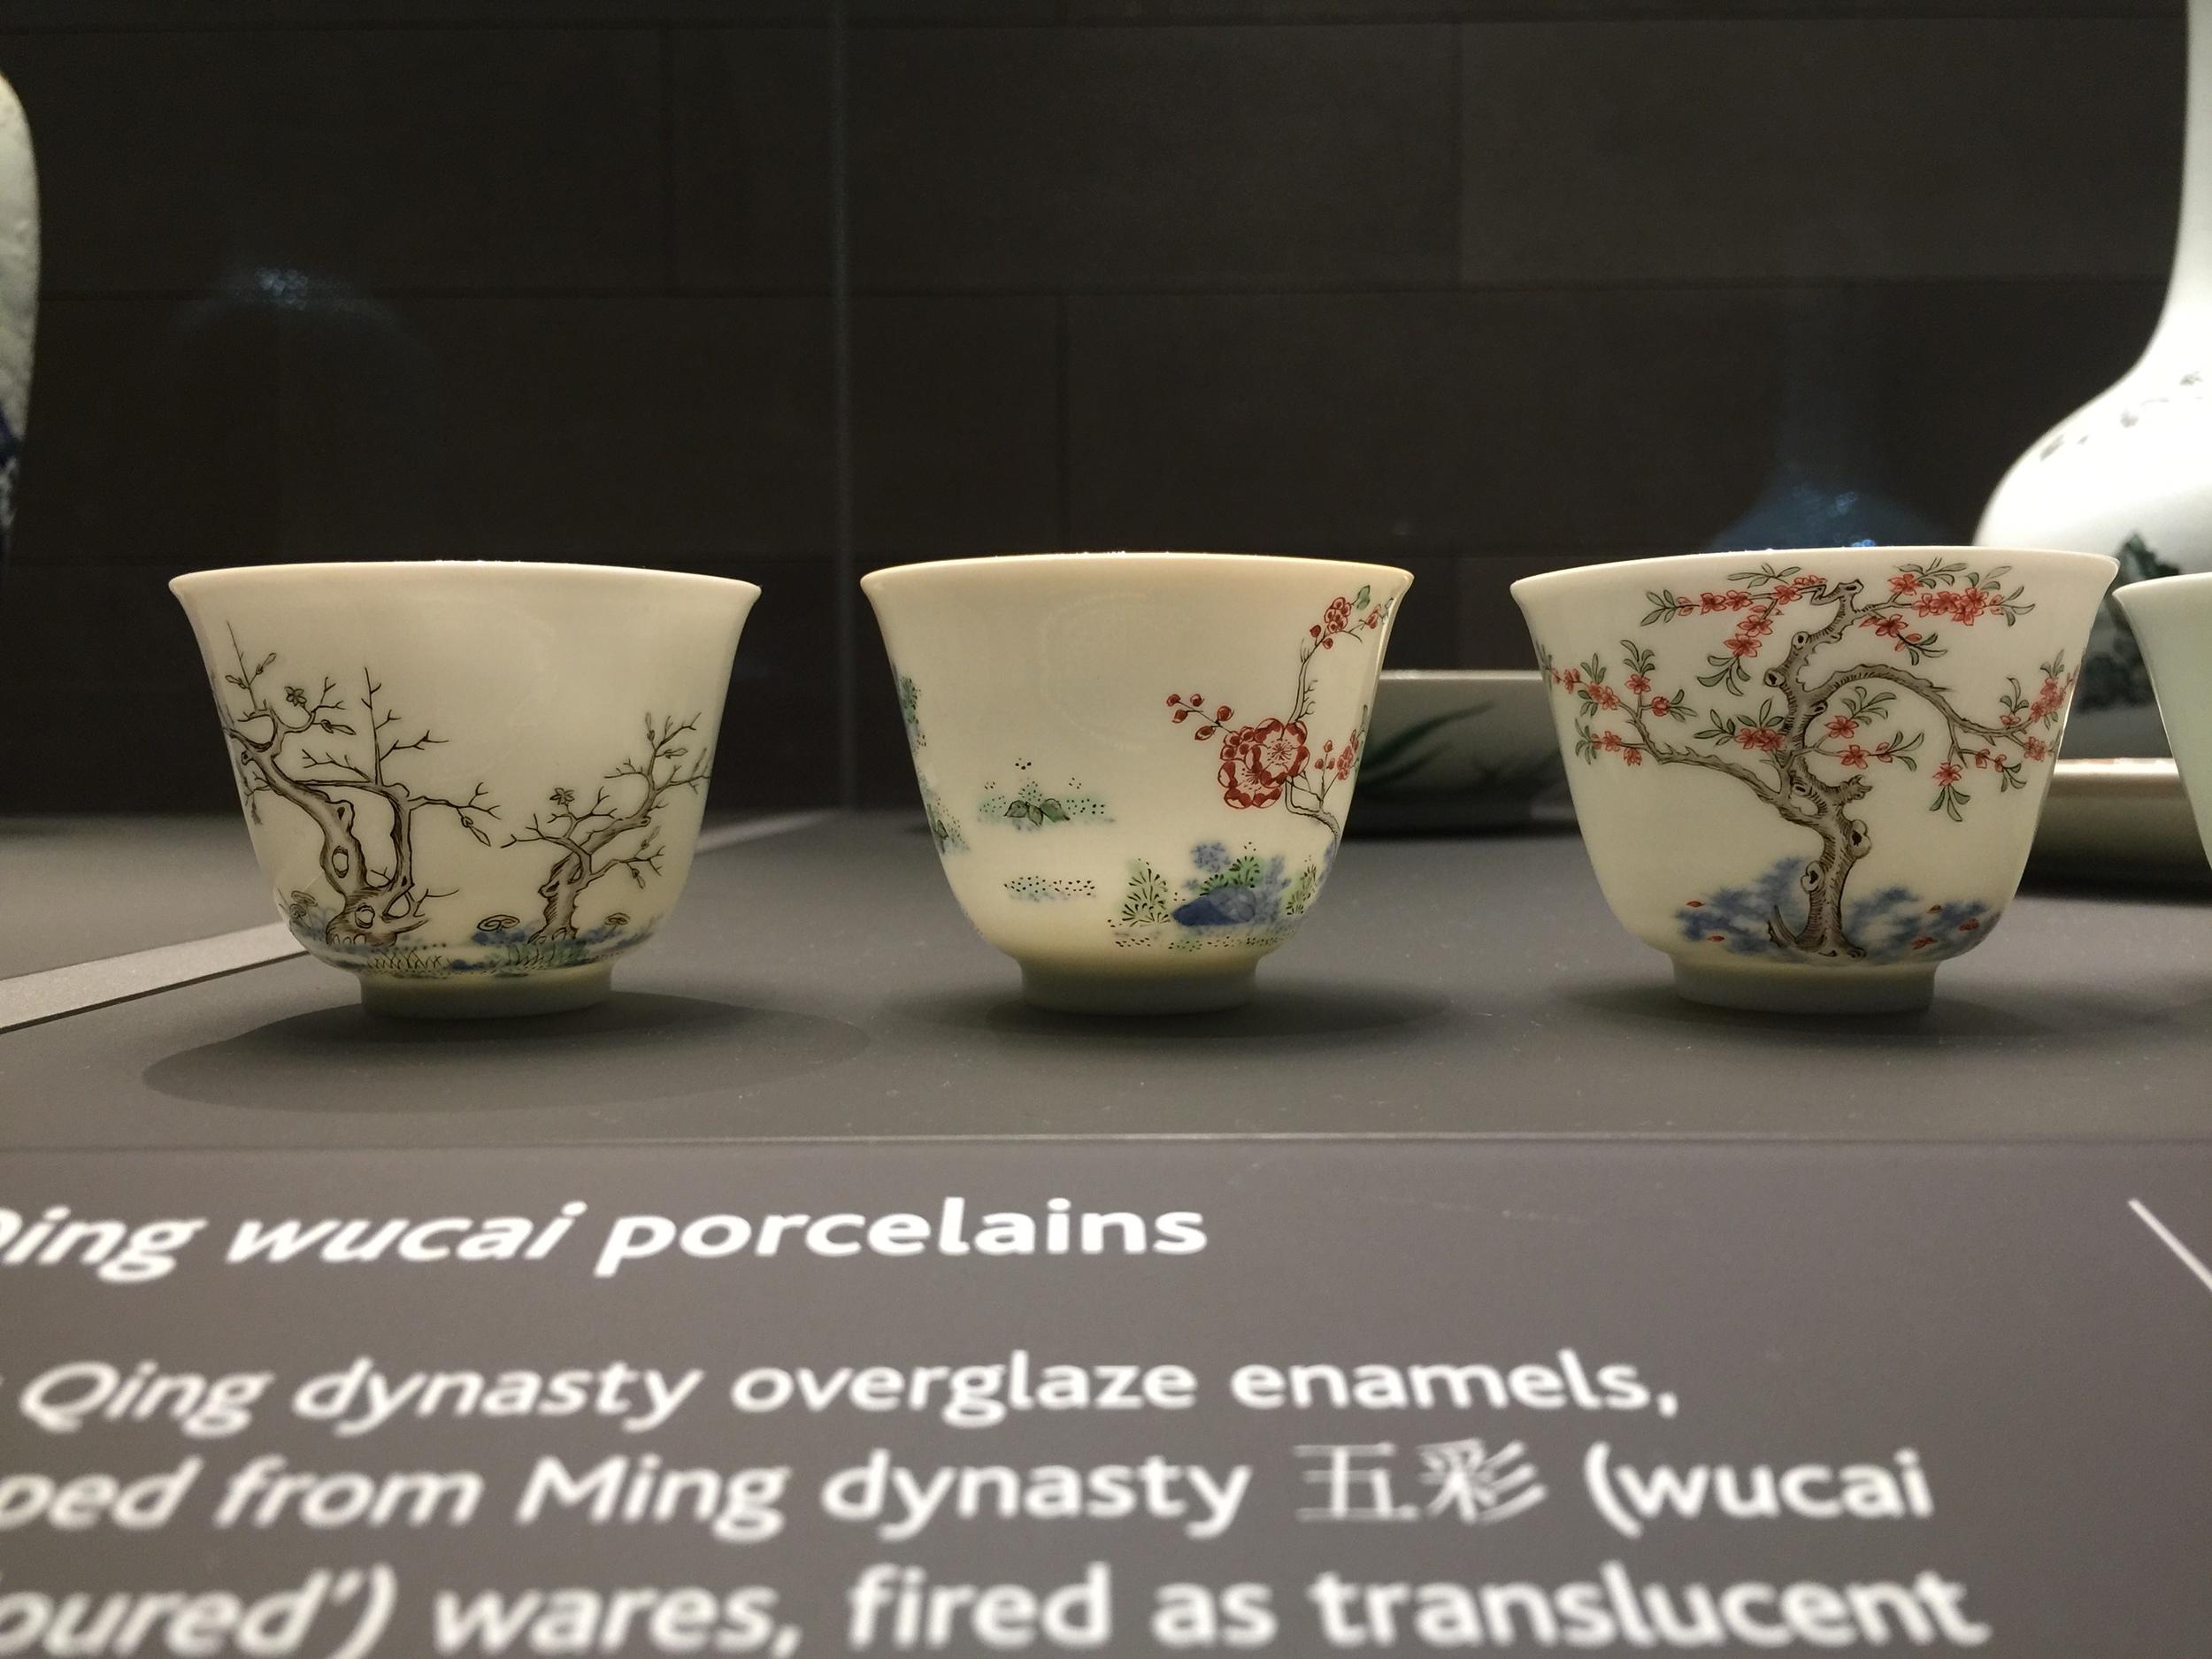 Chinese-Porcelain-British-Museum-Percival-David-jessewaugh.com-126.jpg